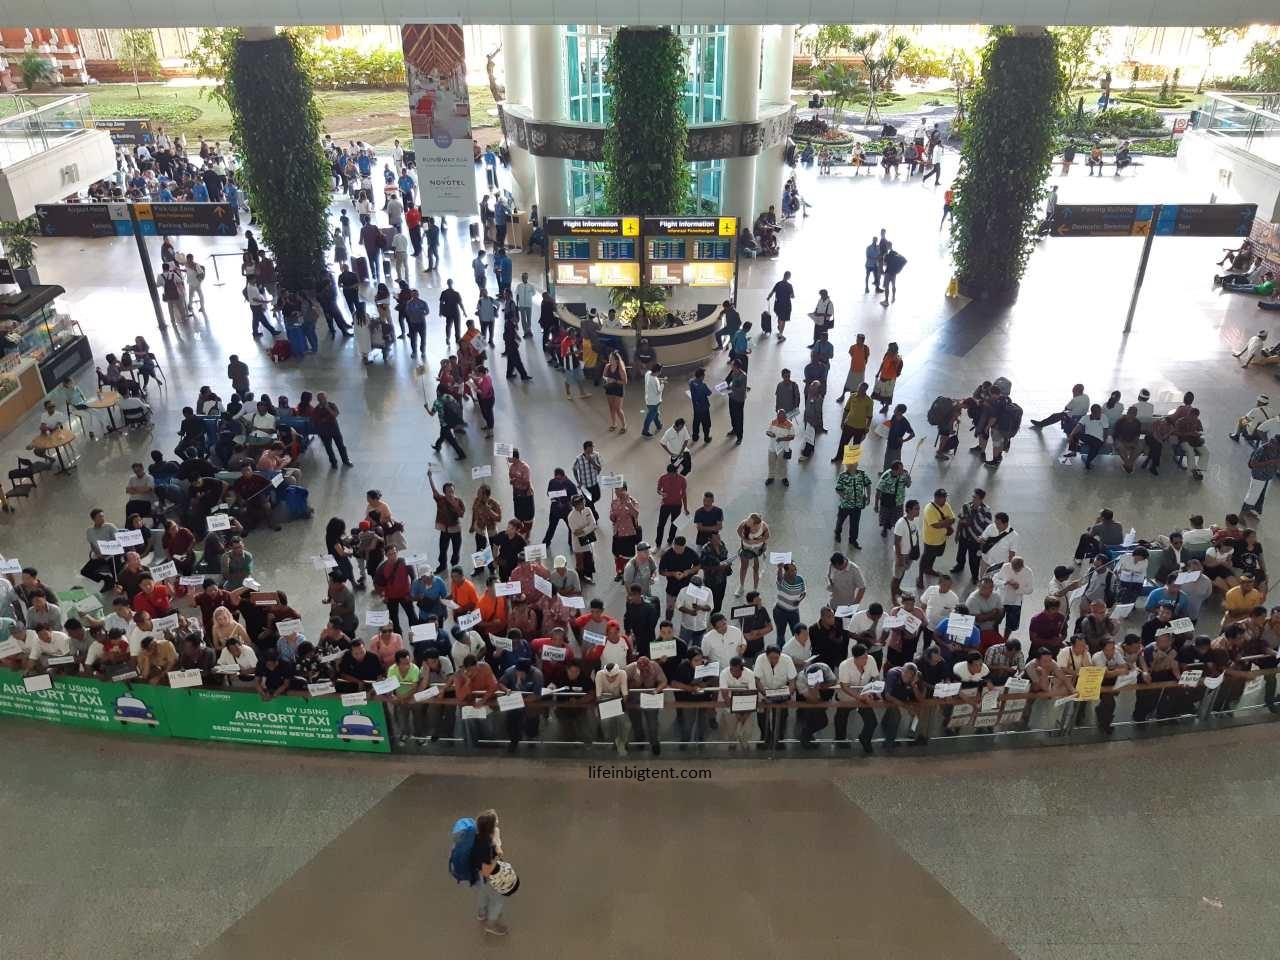 Balio oro uosto laukiamasis